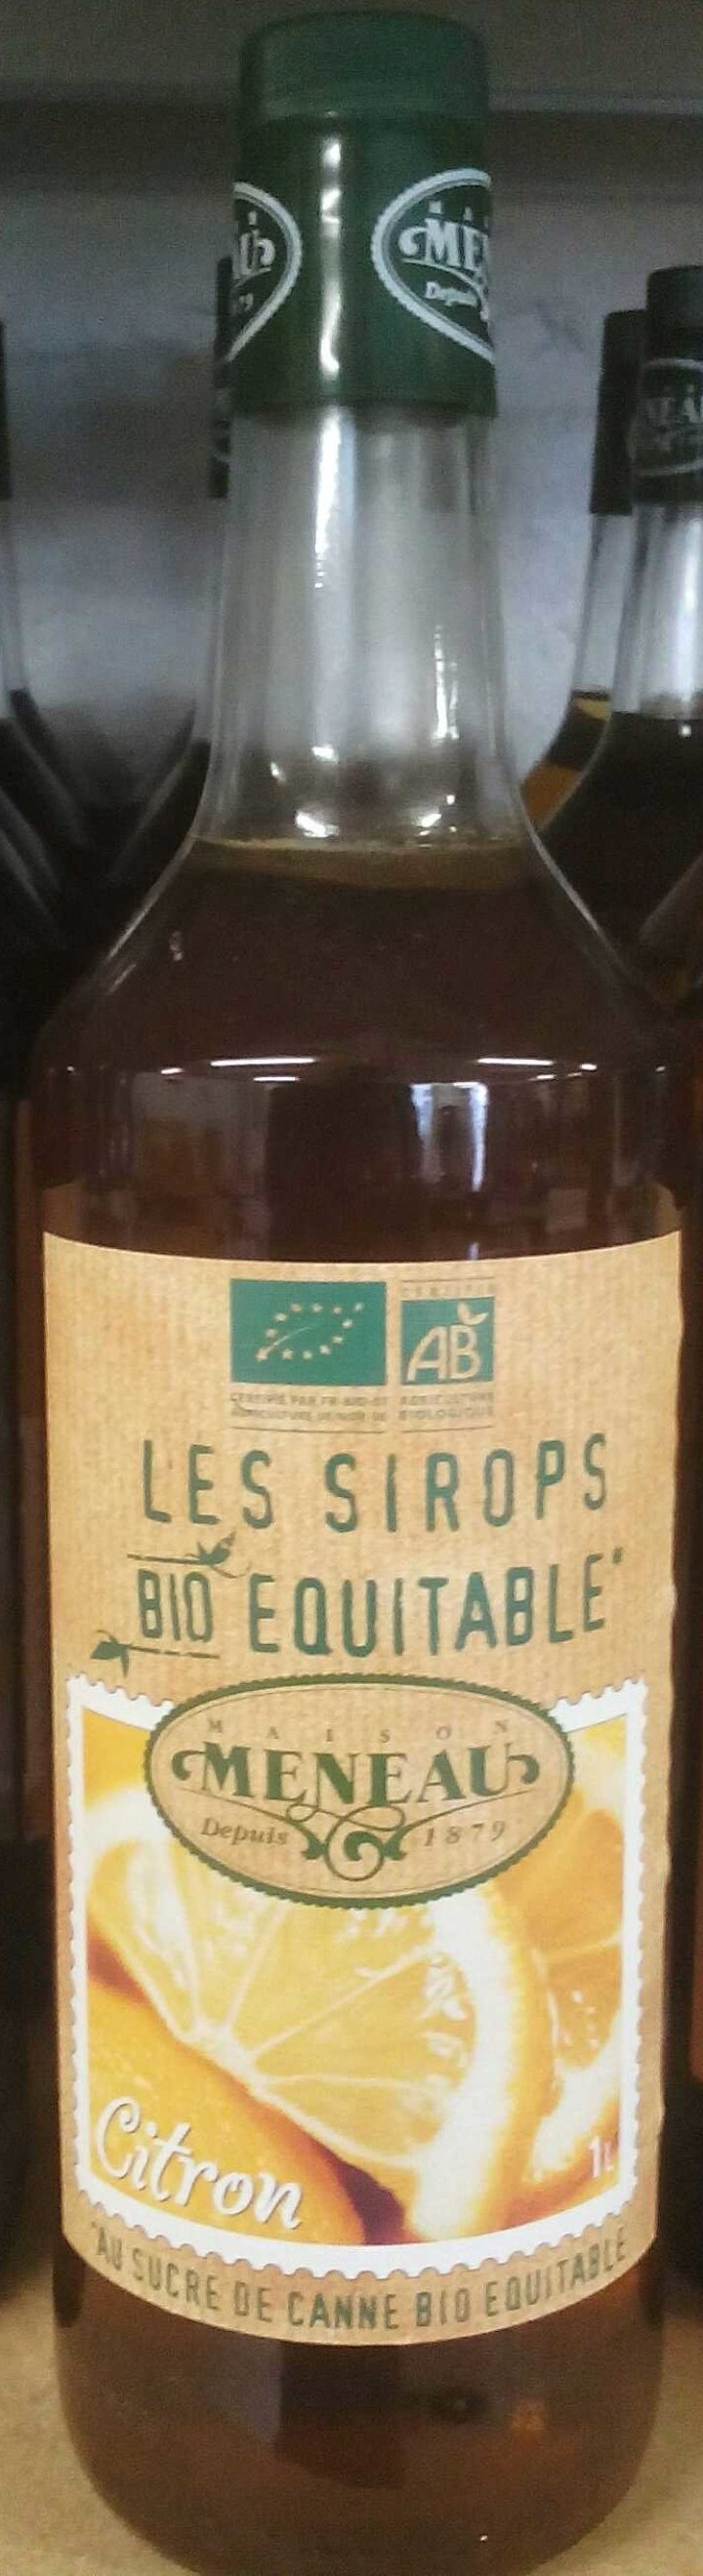 Sirop Citron - Product - fr